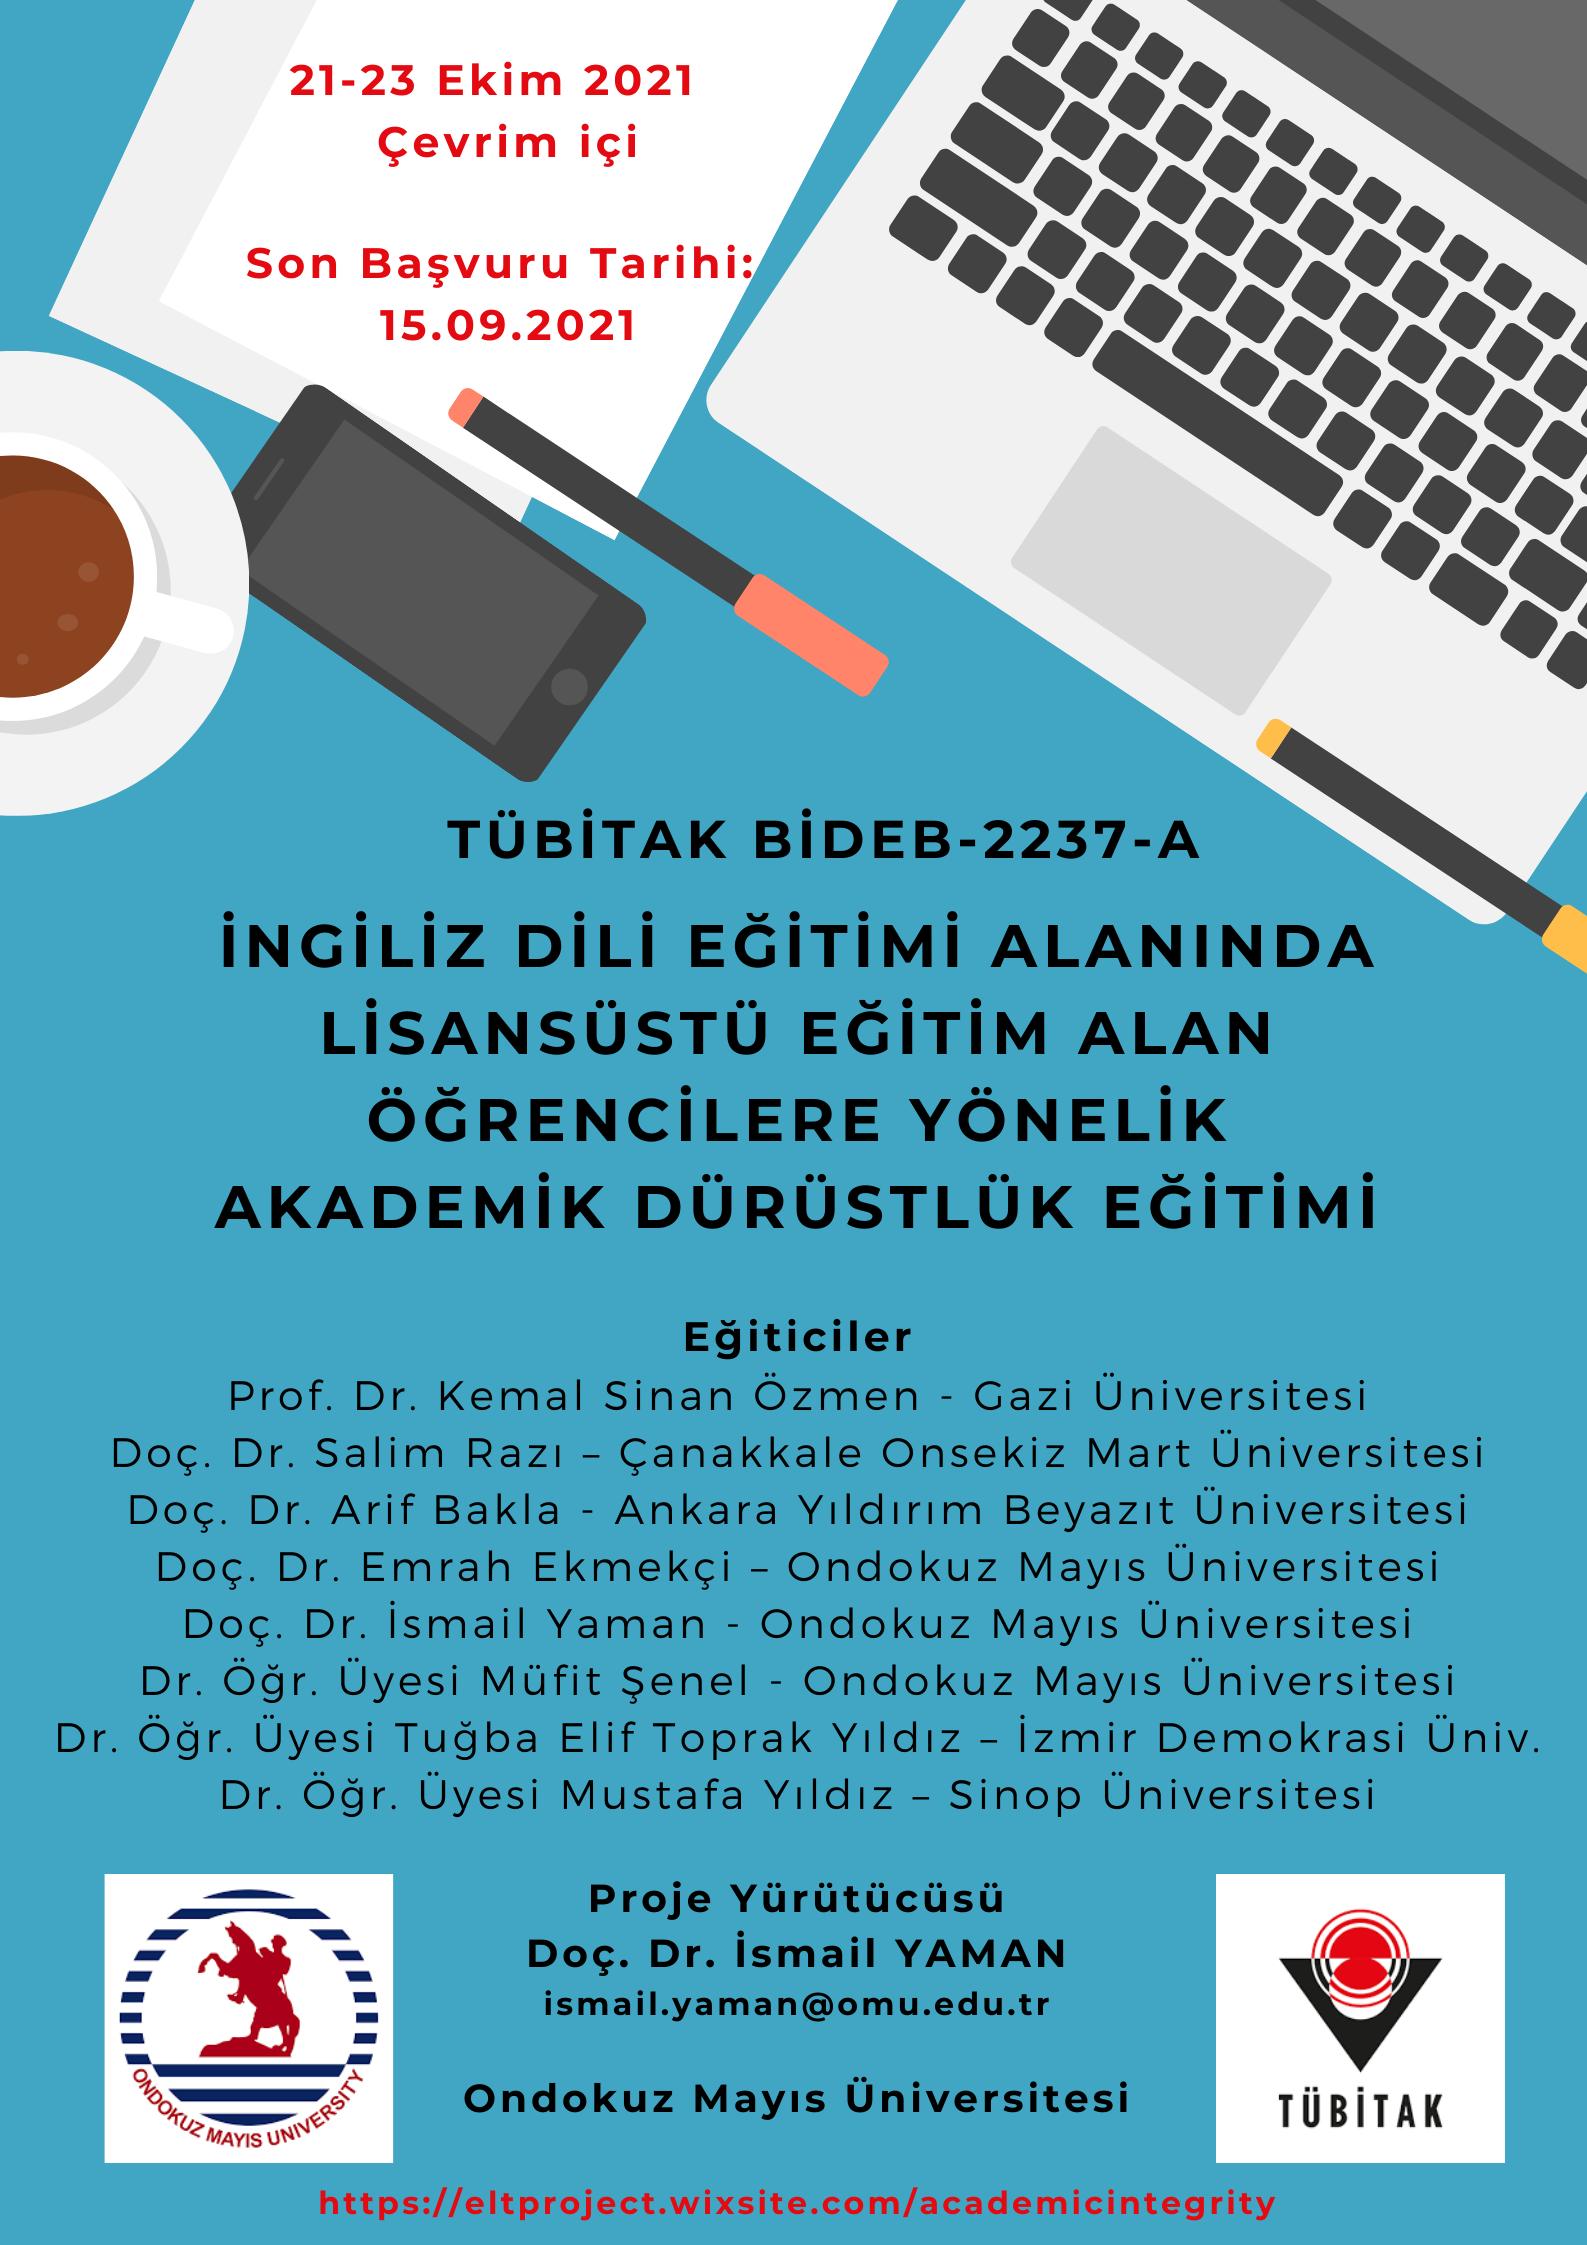 https://www.omu.edu.tr/sites/default/files/tubitak_proje_afisi-doc._dr._ismail_yaman_0.png